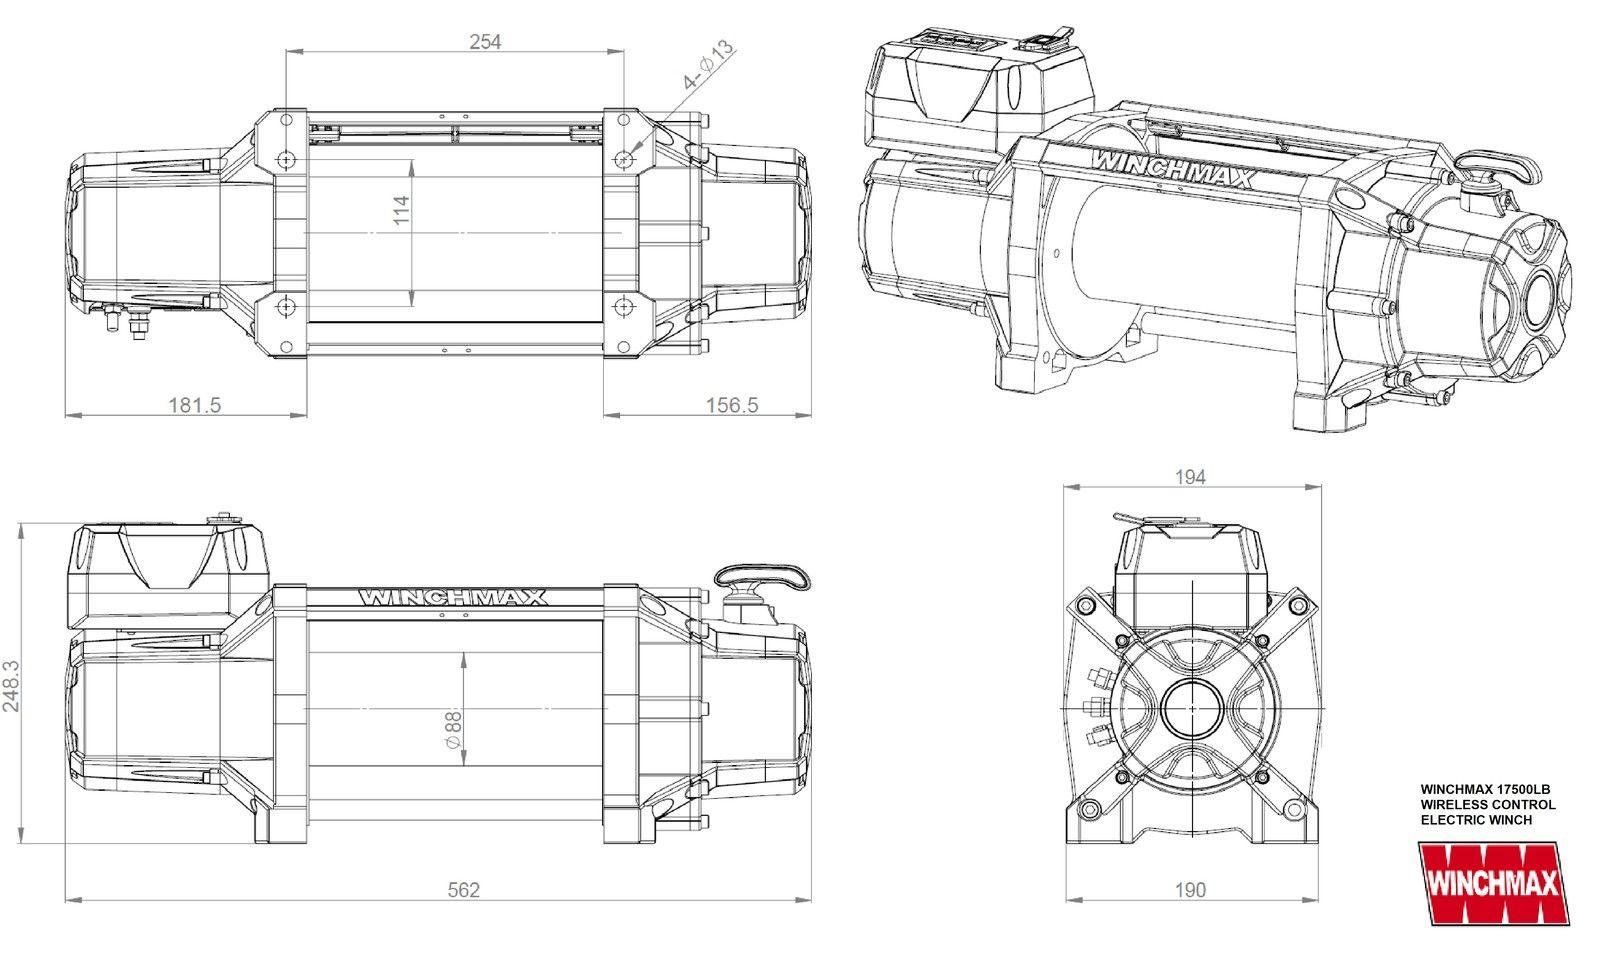 WINCHMAX original orange 12v electric winch. 17,500lbs (7